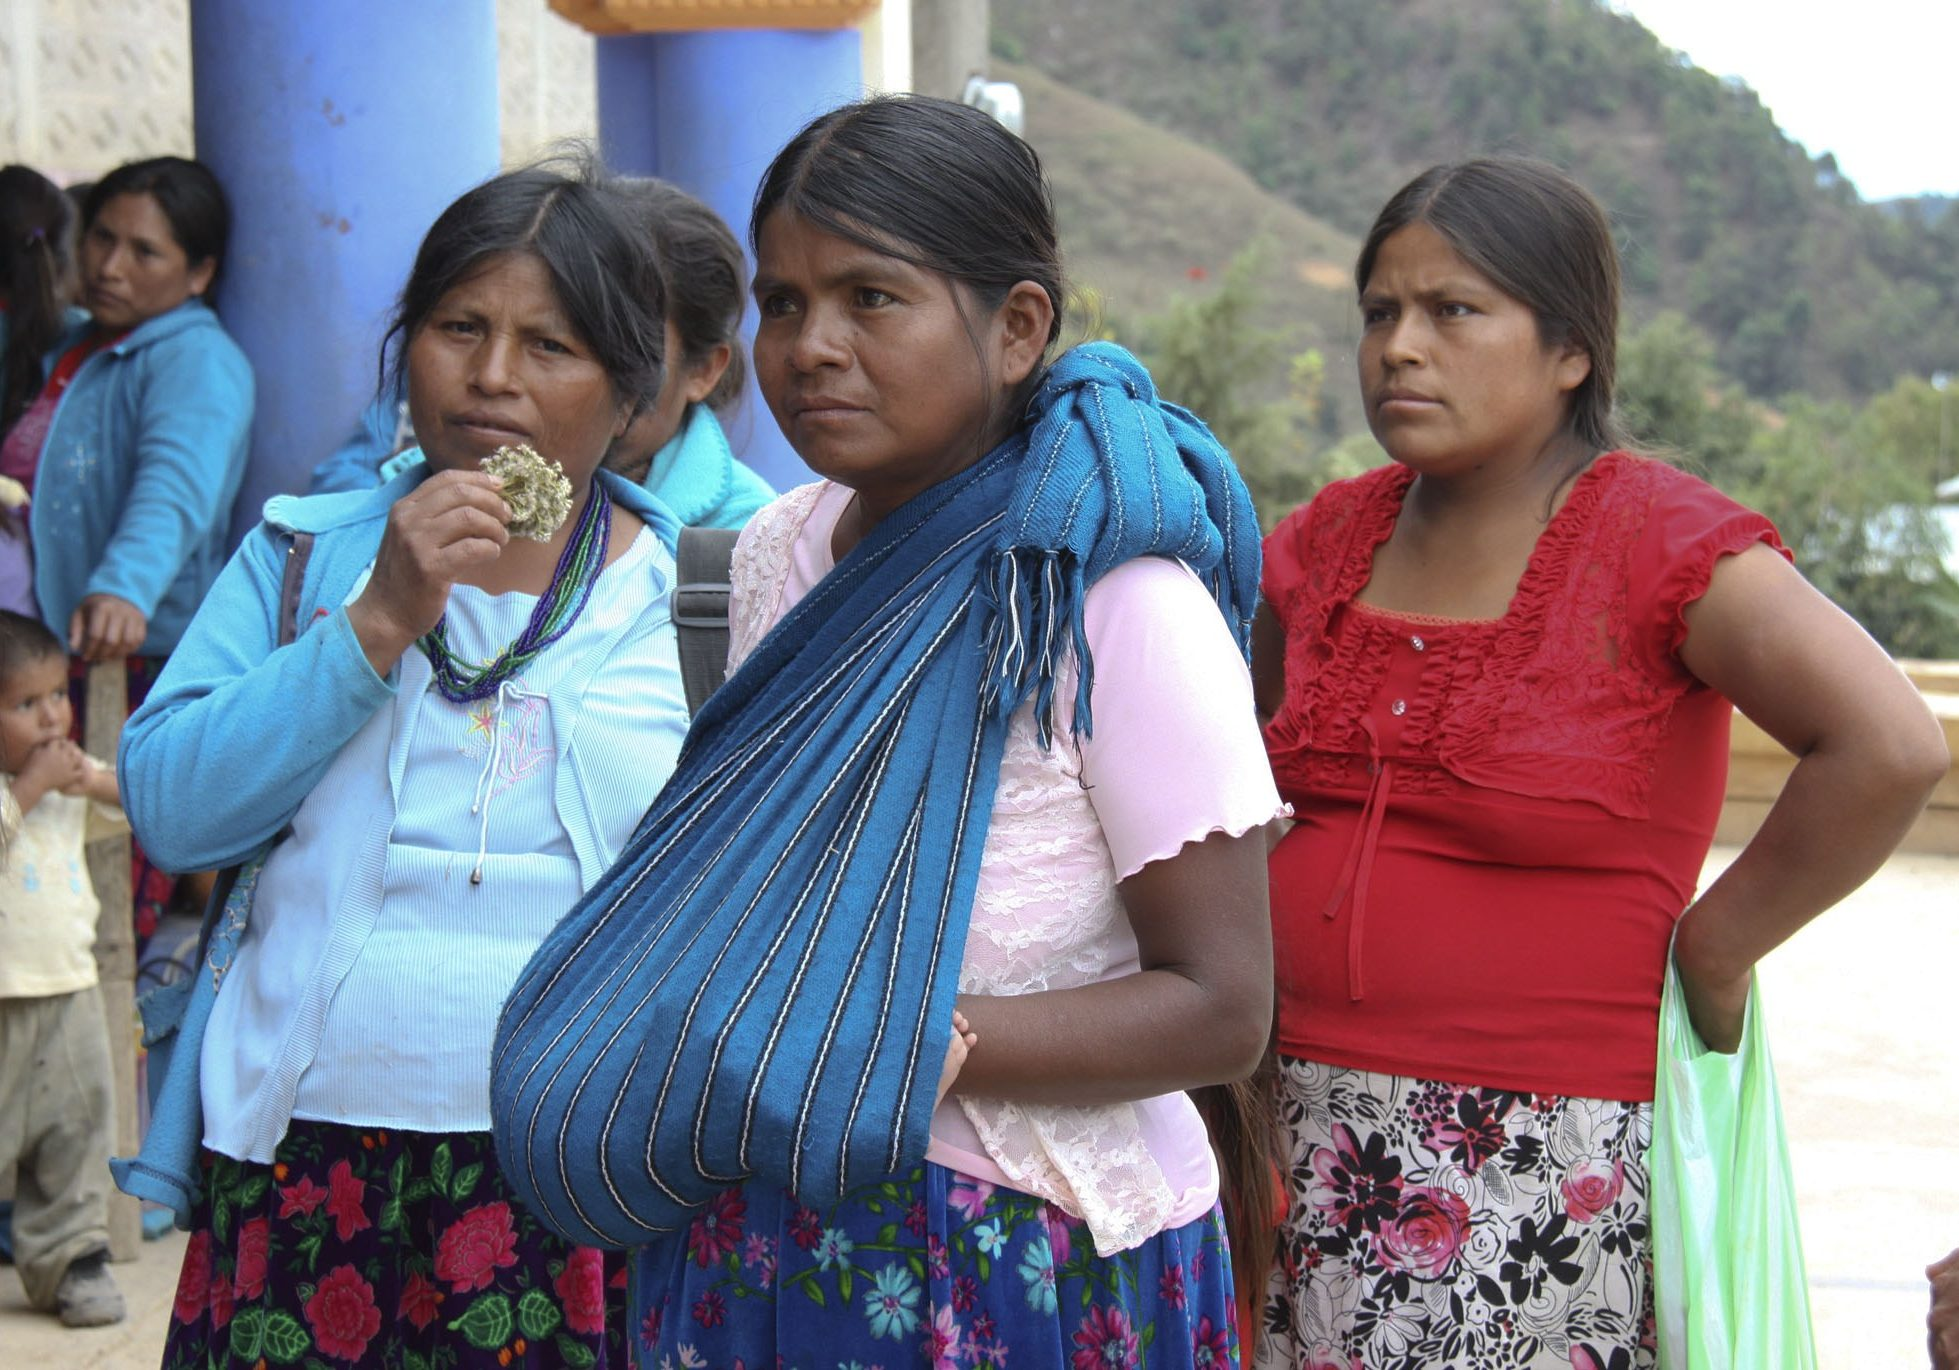 Women in Oaxaca, Mexico. Image source: ororadio.com.mx